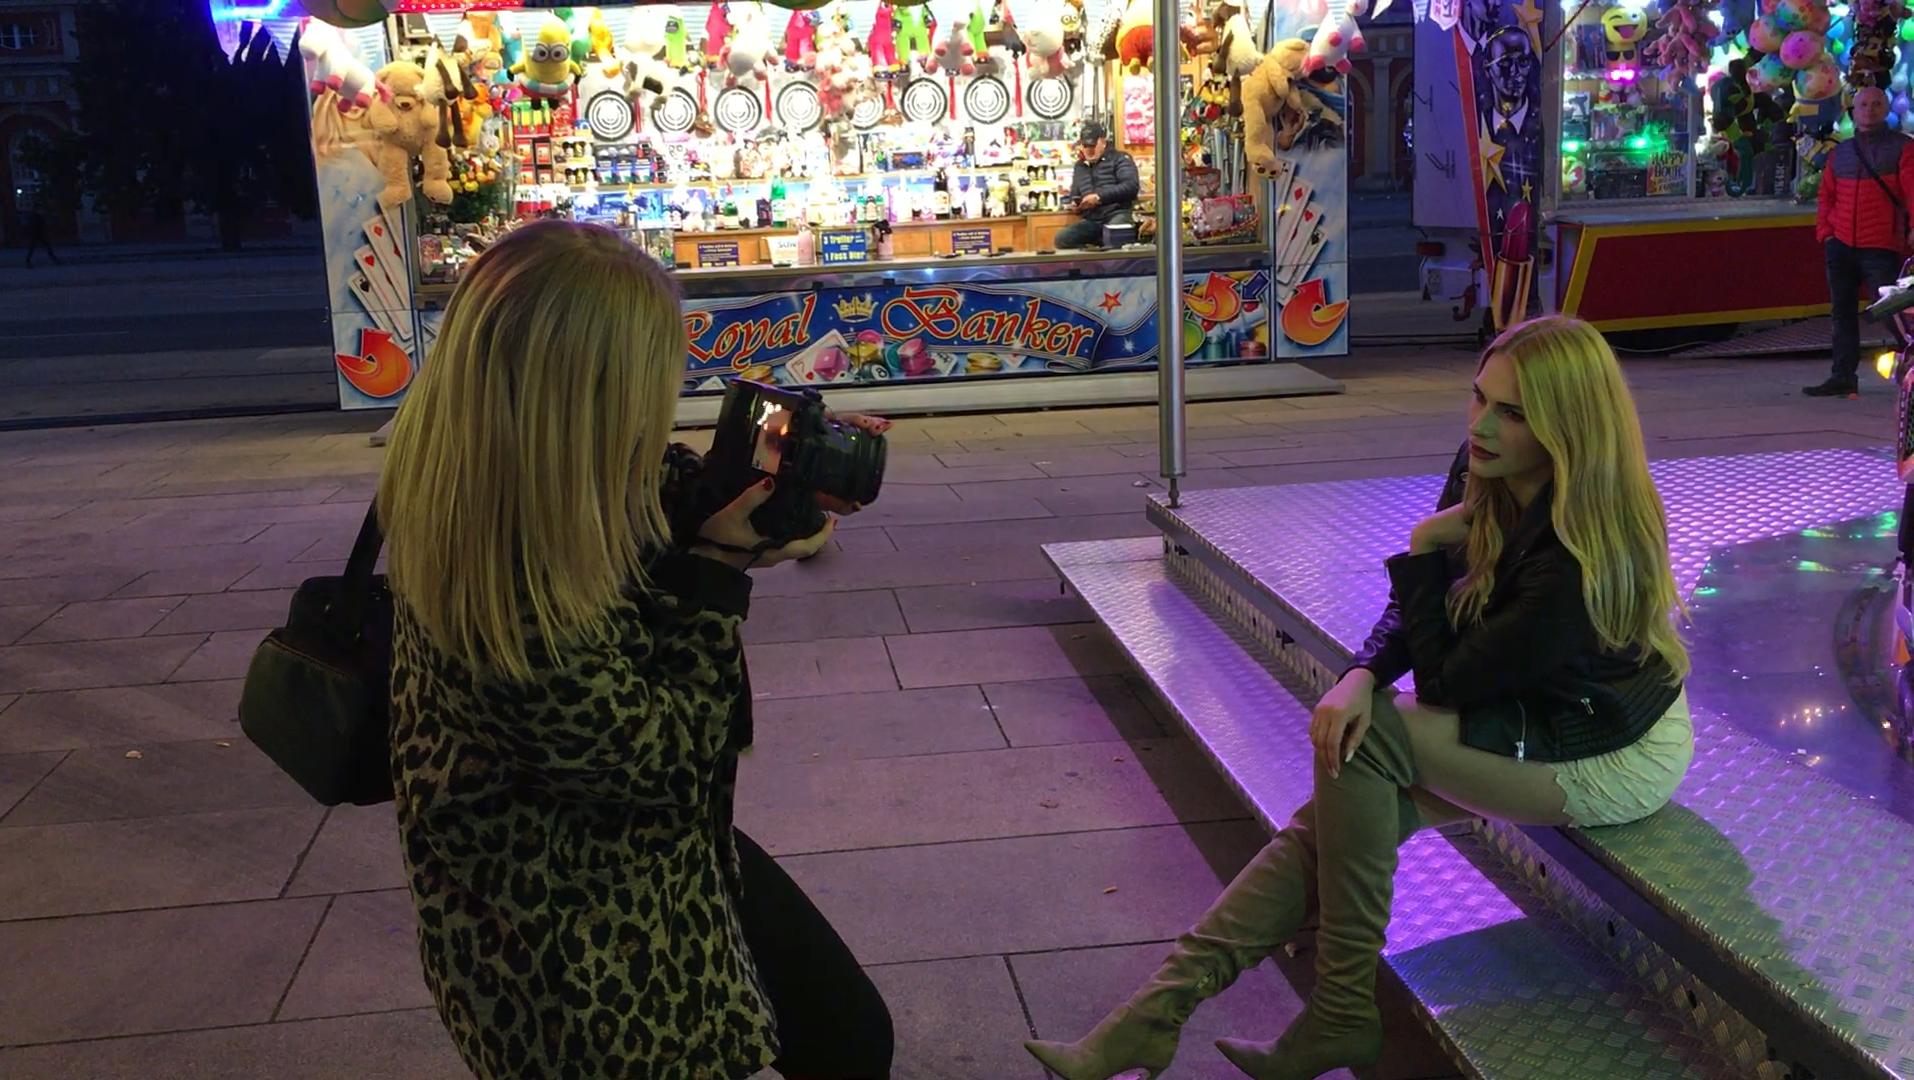 Christina Key fotografiert im Live View Modus